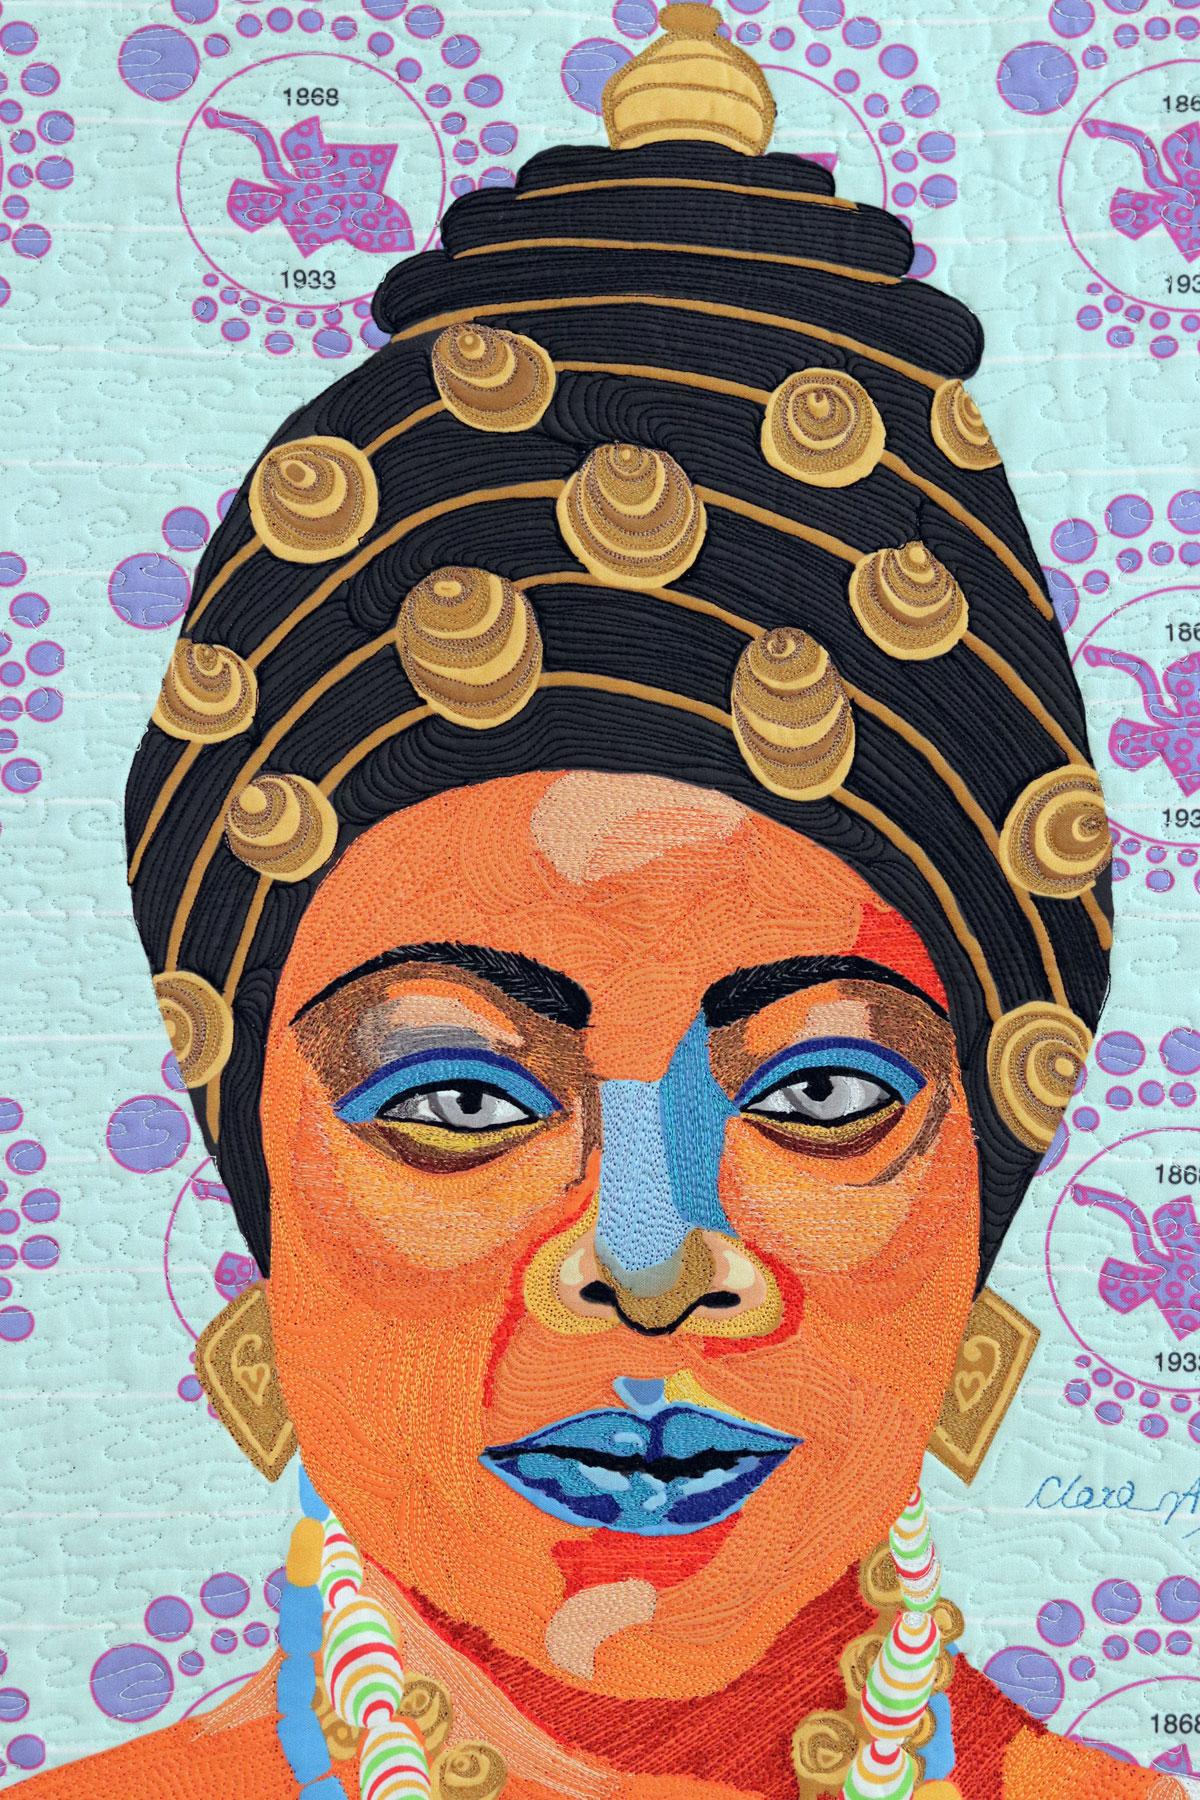 Sissieretta Jones | Fiber art| Textile Art | Thread painting| Black Patti |  Matilda Jones